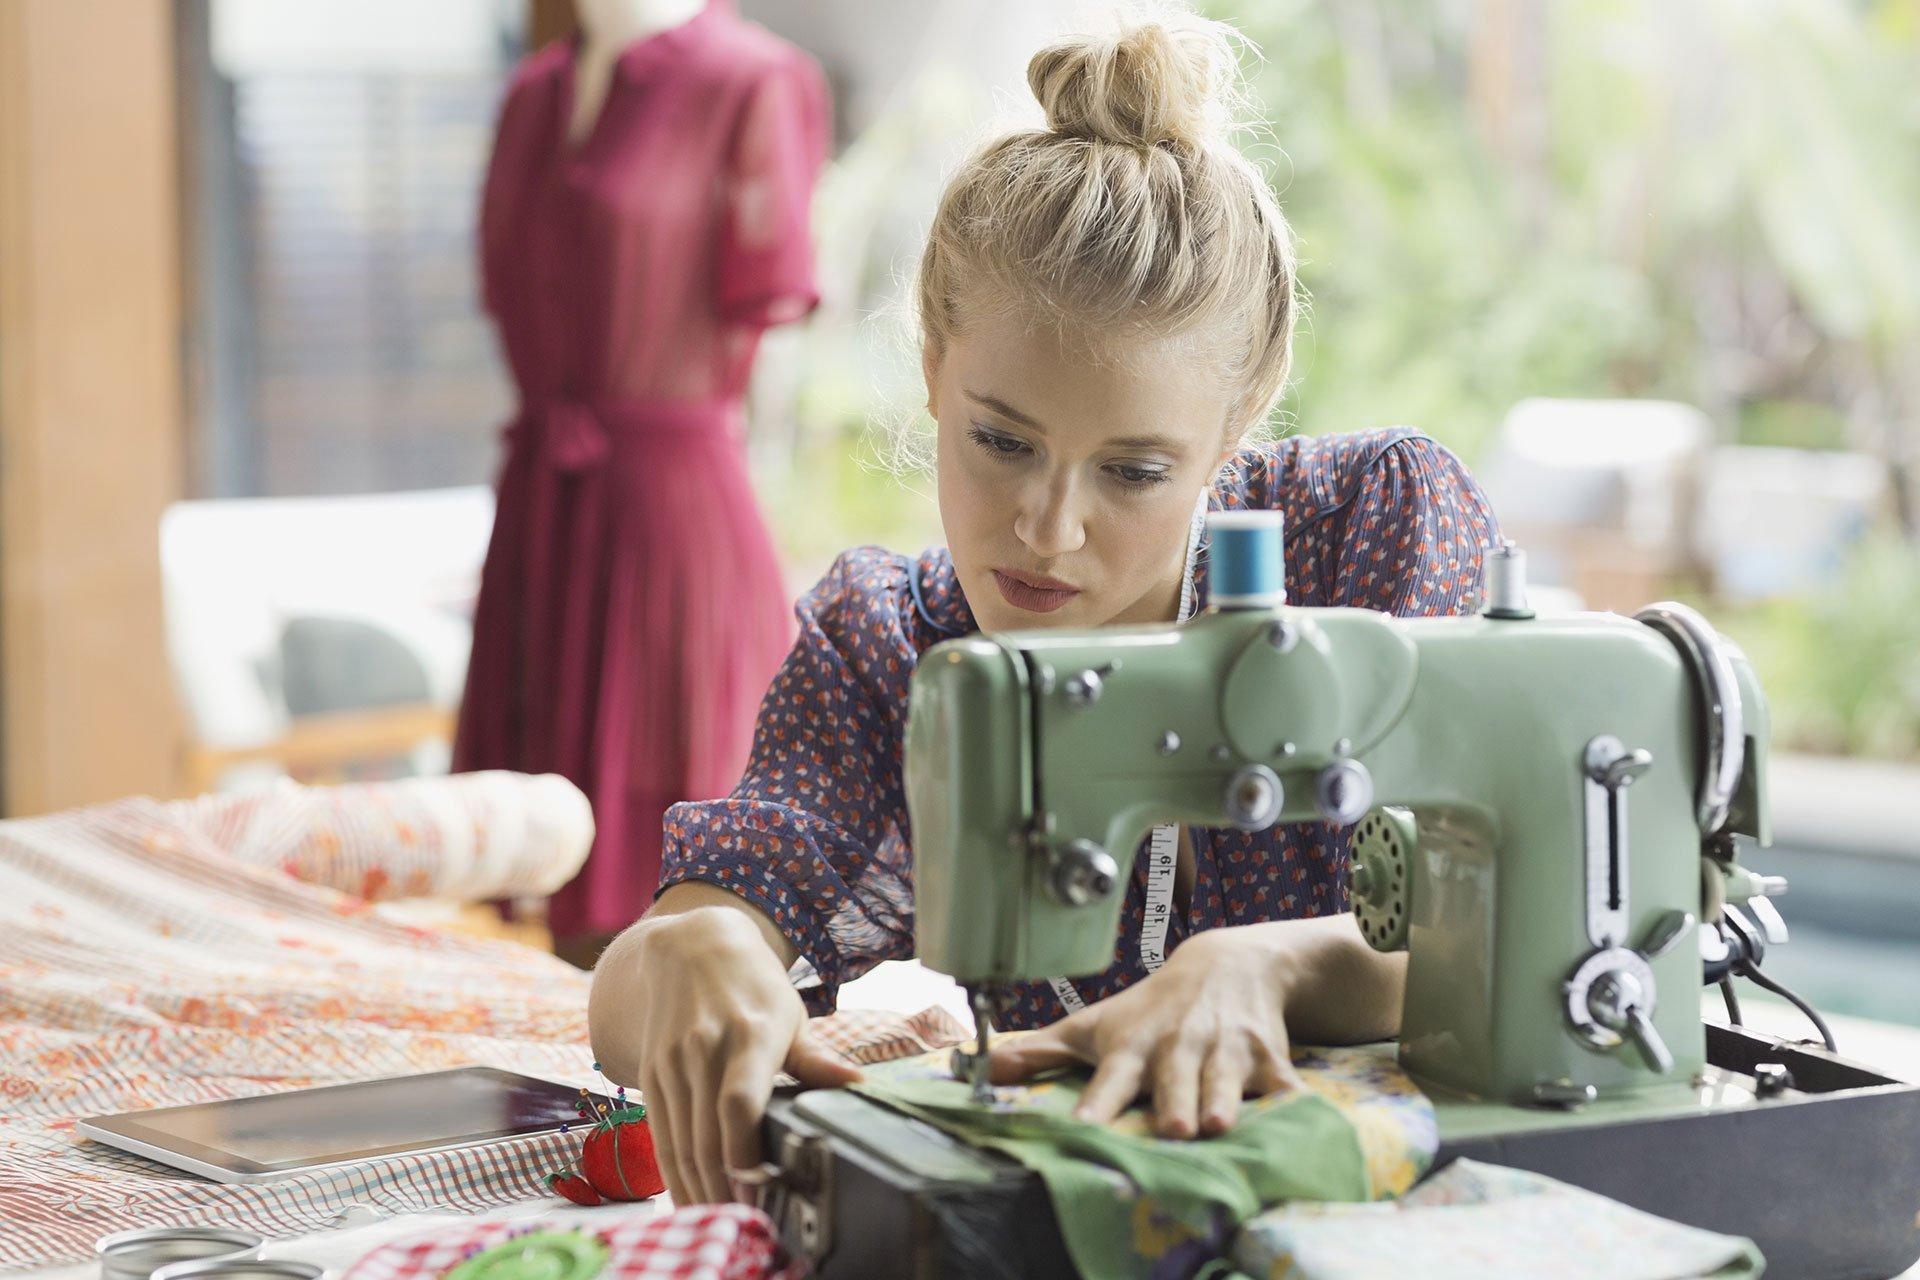 13 Fashion designer sewing machine